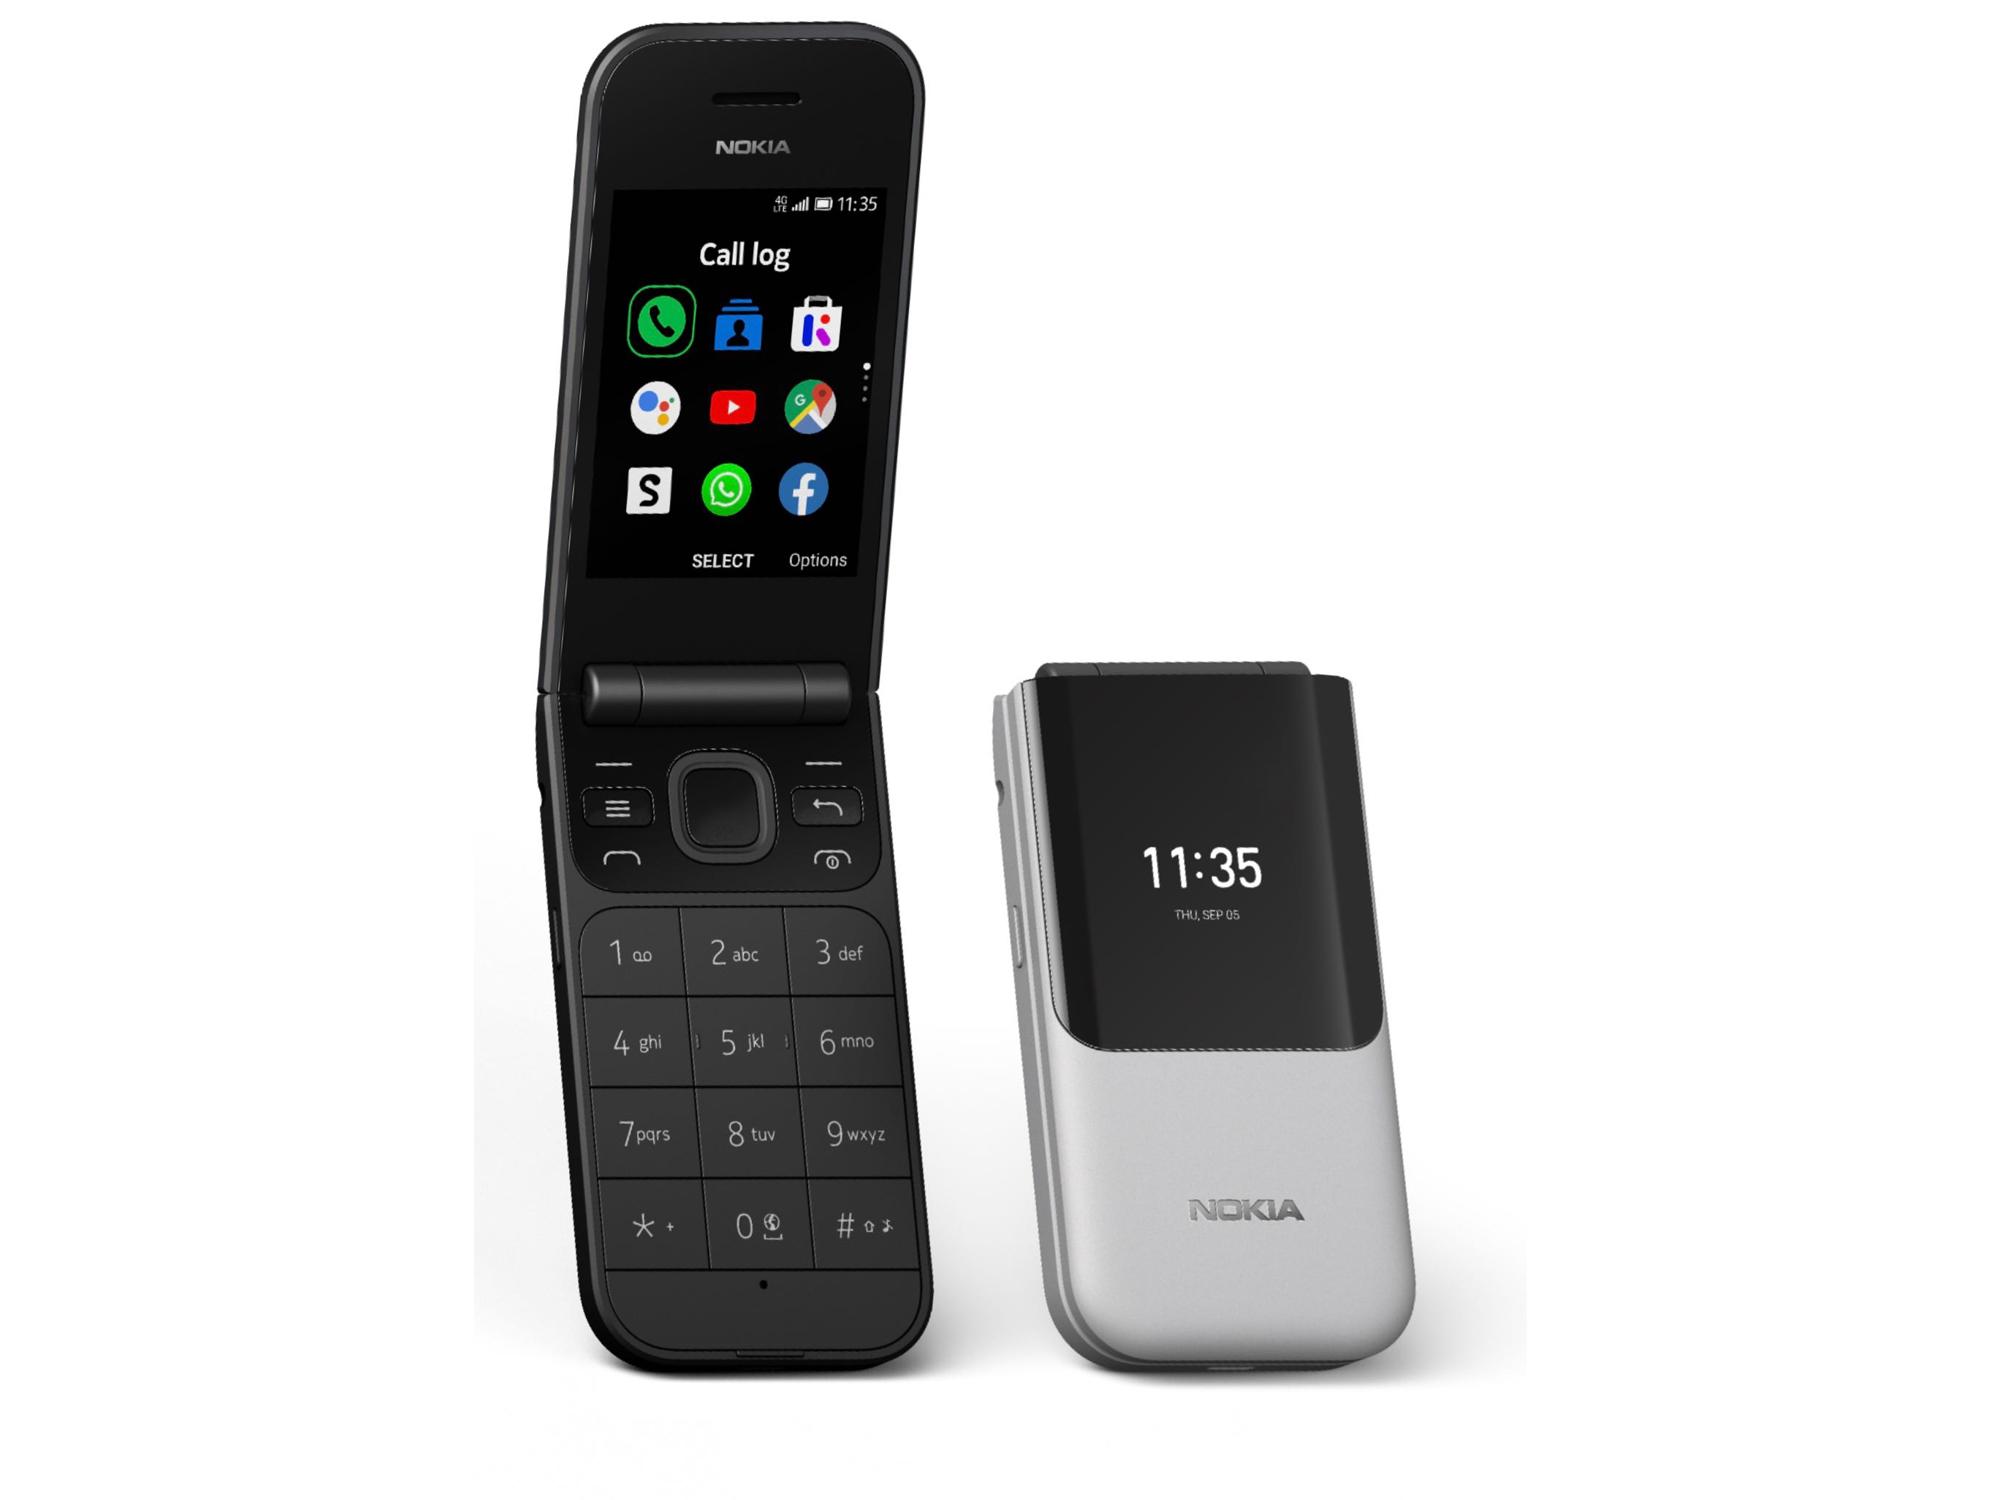 Snake Helped Sell 10 Million Retro Nokias, Flip-Phone Is